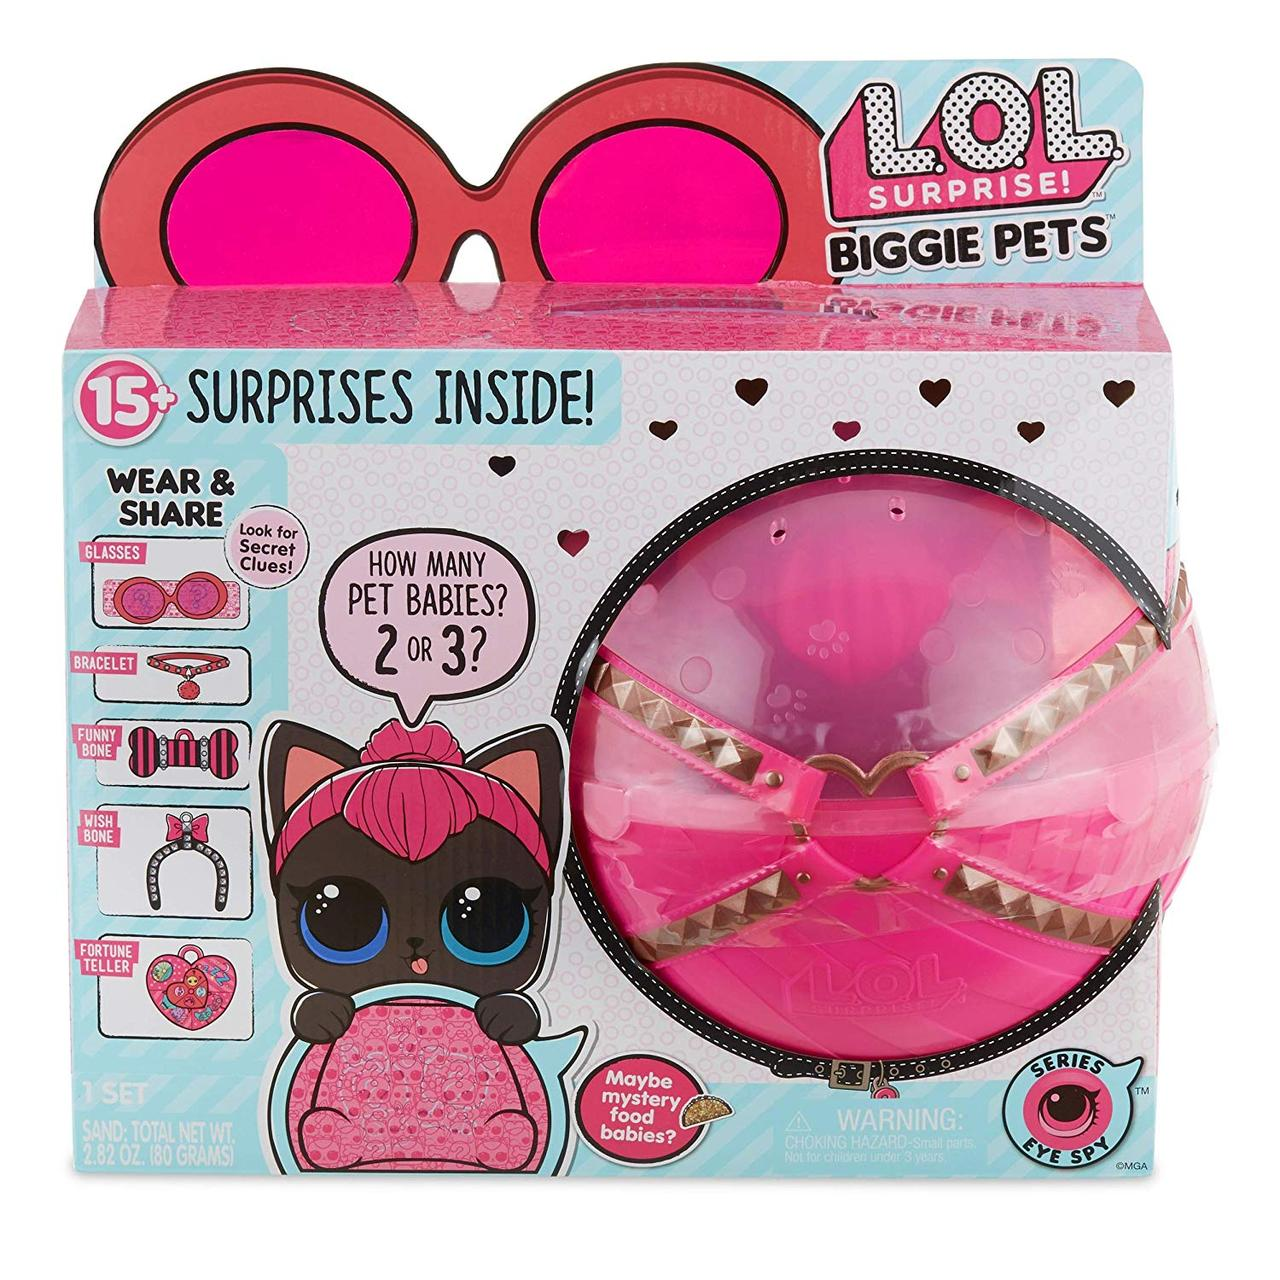 Л.О.Л. Большой Питомец Кошечка Перчинка / L.O.L. Surprise! Biggie Pet - Spicy Kitty